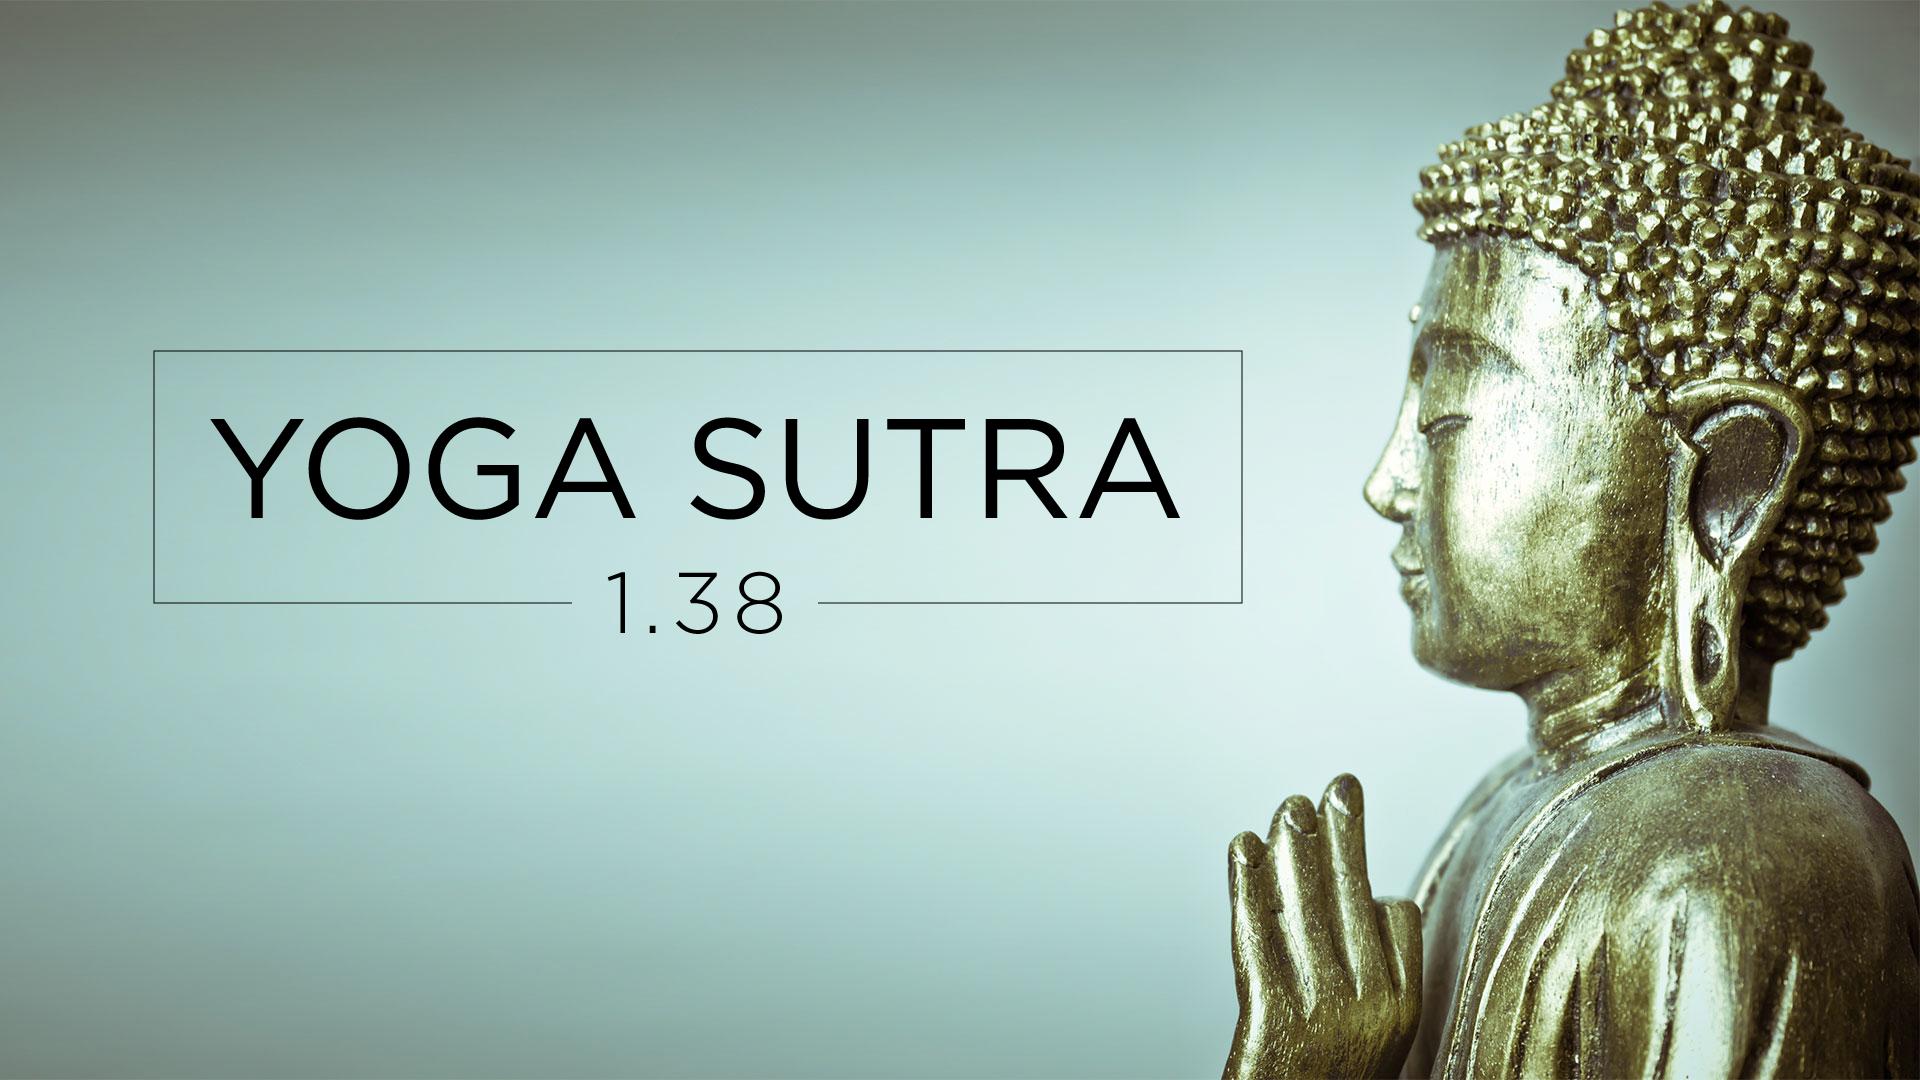 Yoga Sutra 1.38